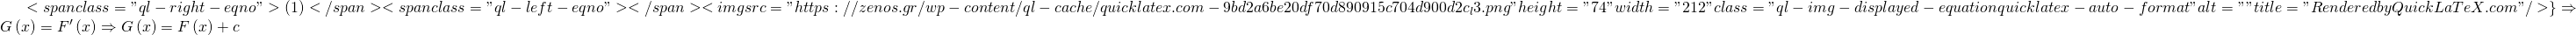 "\left. <span class=""ql-right-eqno""> (1) </span><span class=""ql-left-eqno"">   </span><img src=""https://zenos.gr/wp-content/ql-cache/quicklatex.com-9bd2a6be20df70d890915c704d900d2c_l3.png"" height=""74"" width=""212"" class=""ql-img-displayed-equation quicklatex-auto-format"" alt=""\begin{align*}</li>  <li>& {G}'\left( x \right)=f\left( x \right) \\</li>  <li>& {F}'\left( x \right)=f\left( x \right) \\</li>  <li>\end{align*}"" title=""Rendered by QuickLaTeX.com""/> \right\}\Rightarrow G\left( x \right)={F}'\left( x \right)\Rightarrow G\left( x \right)=F\left( x \right)+c"